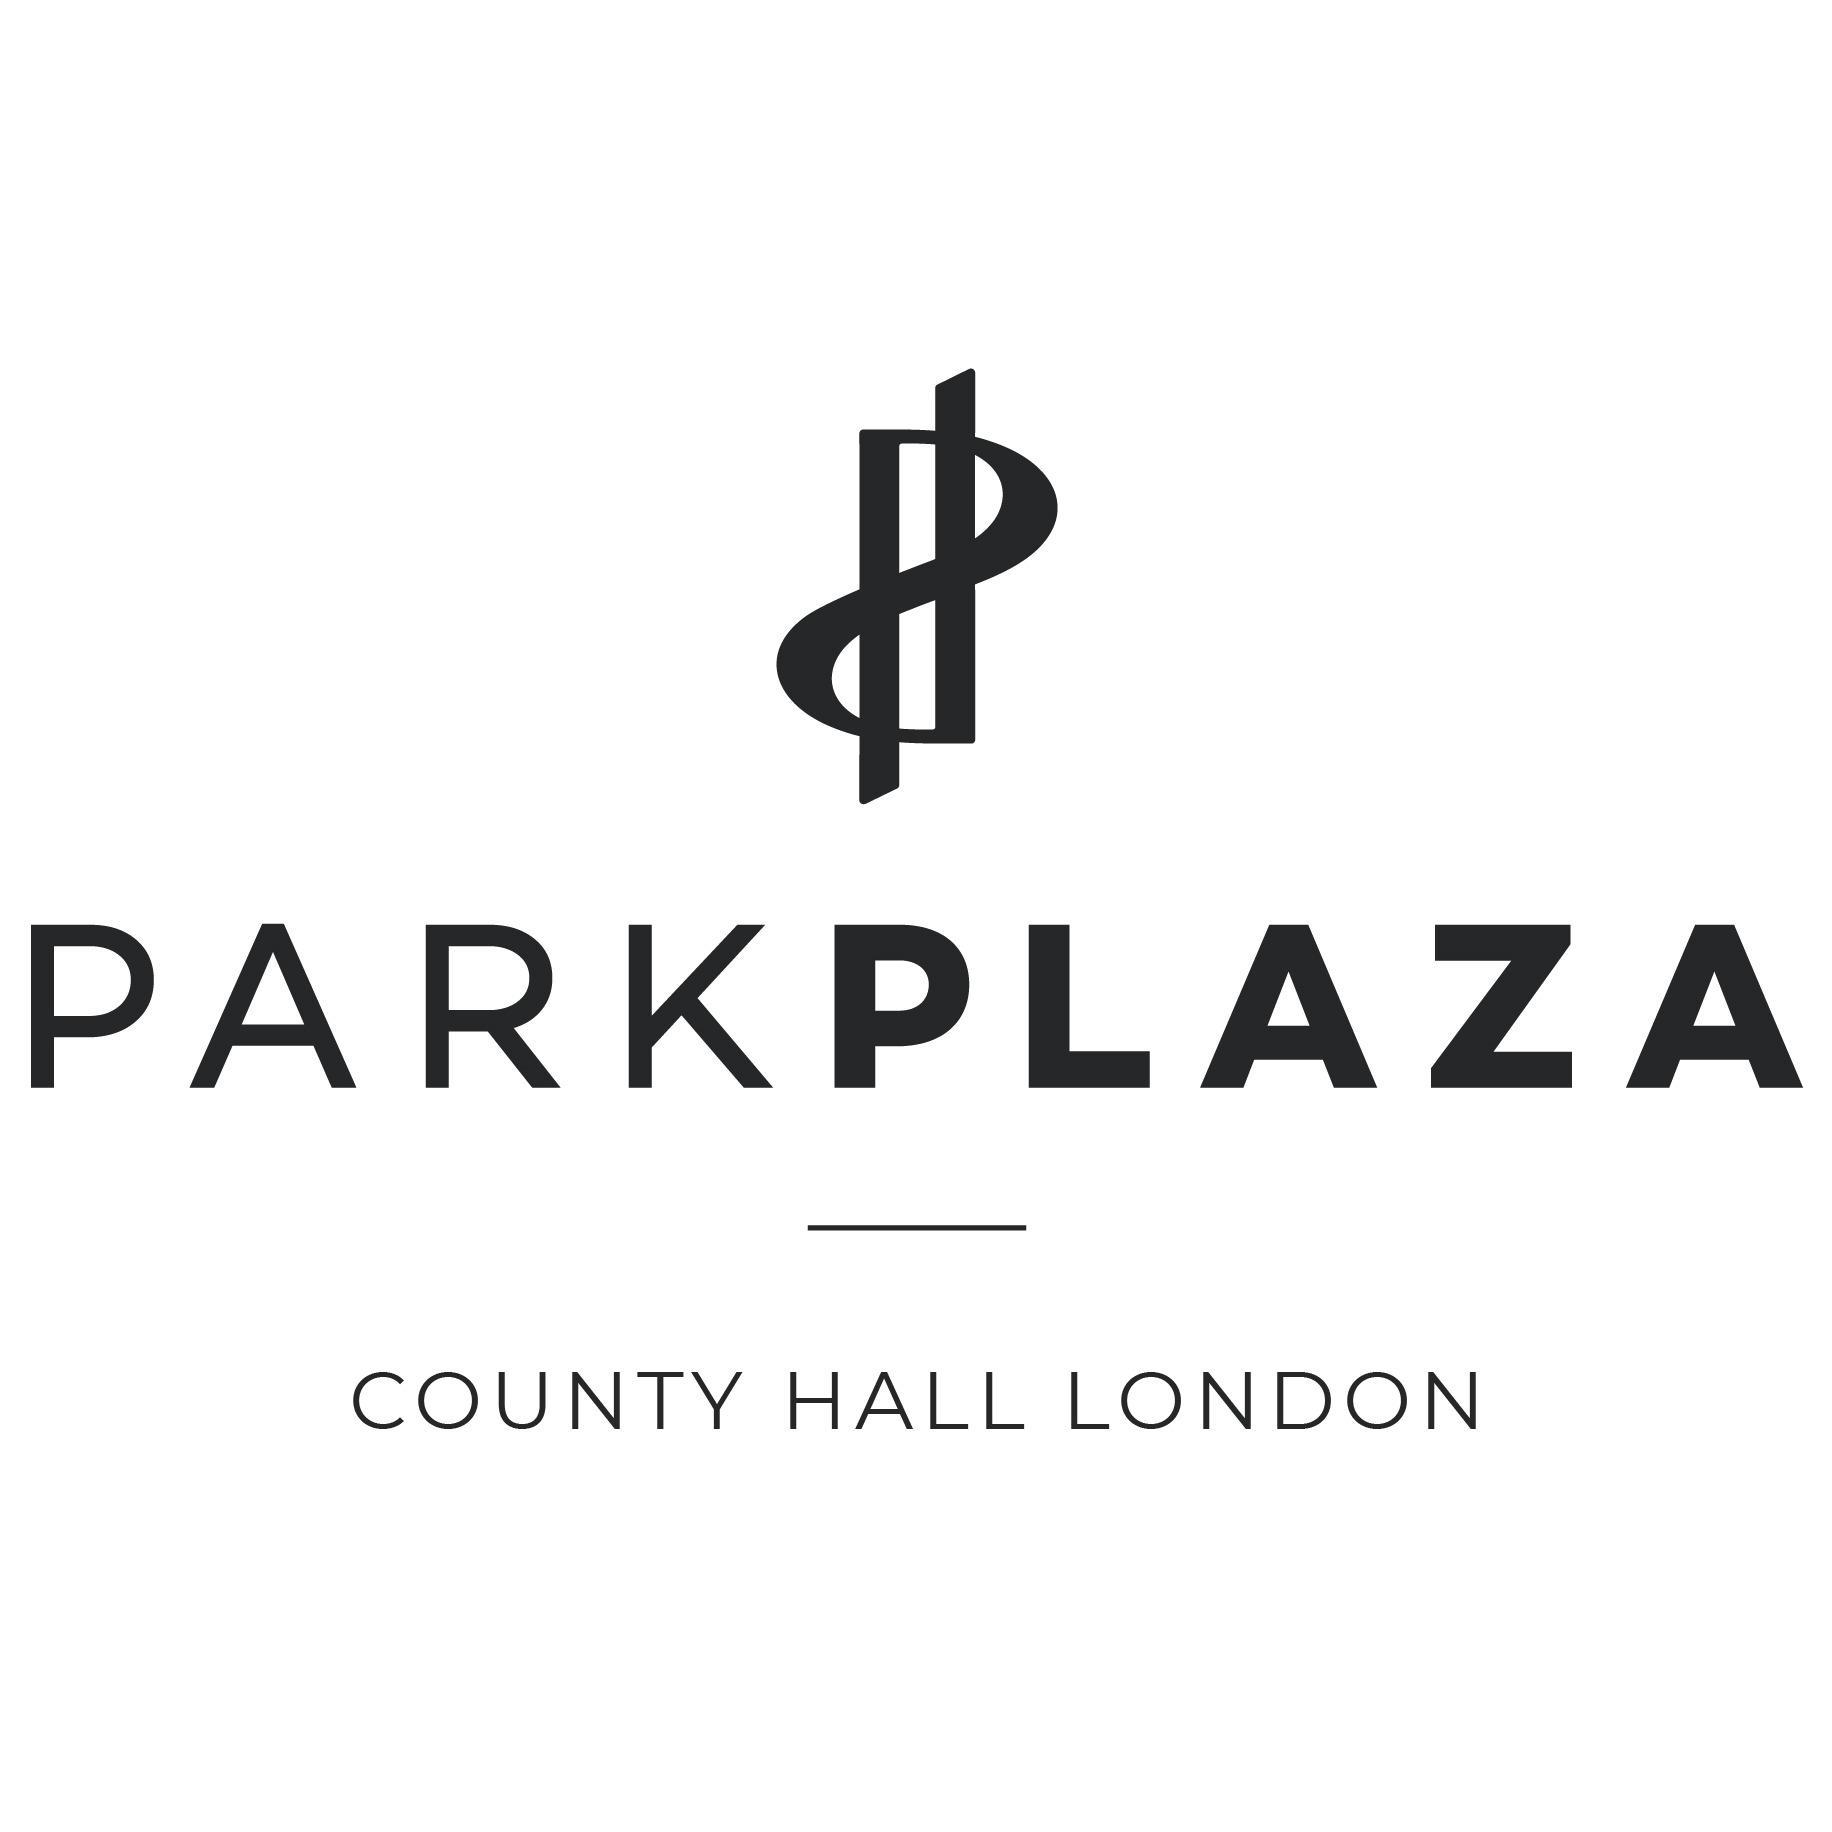 Park Plaza County Hall London